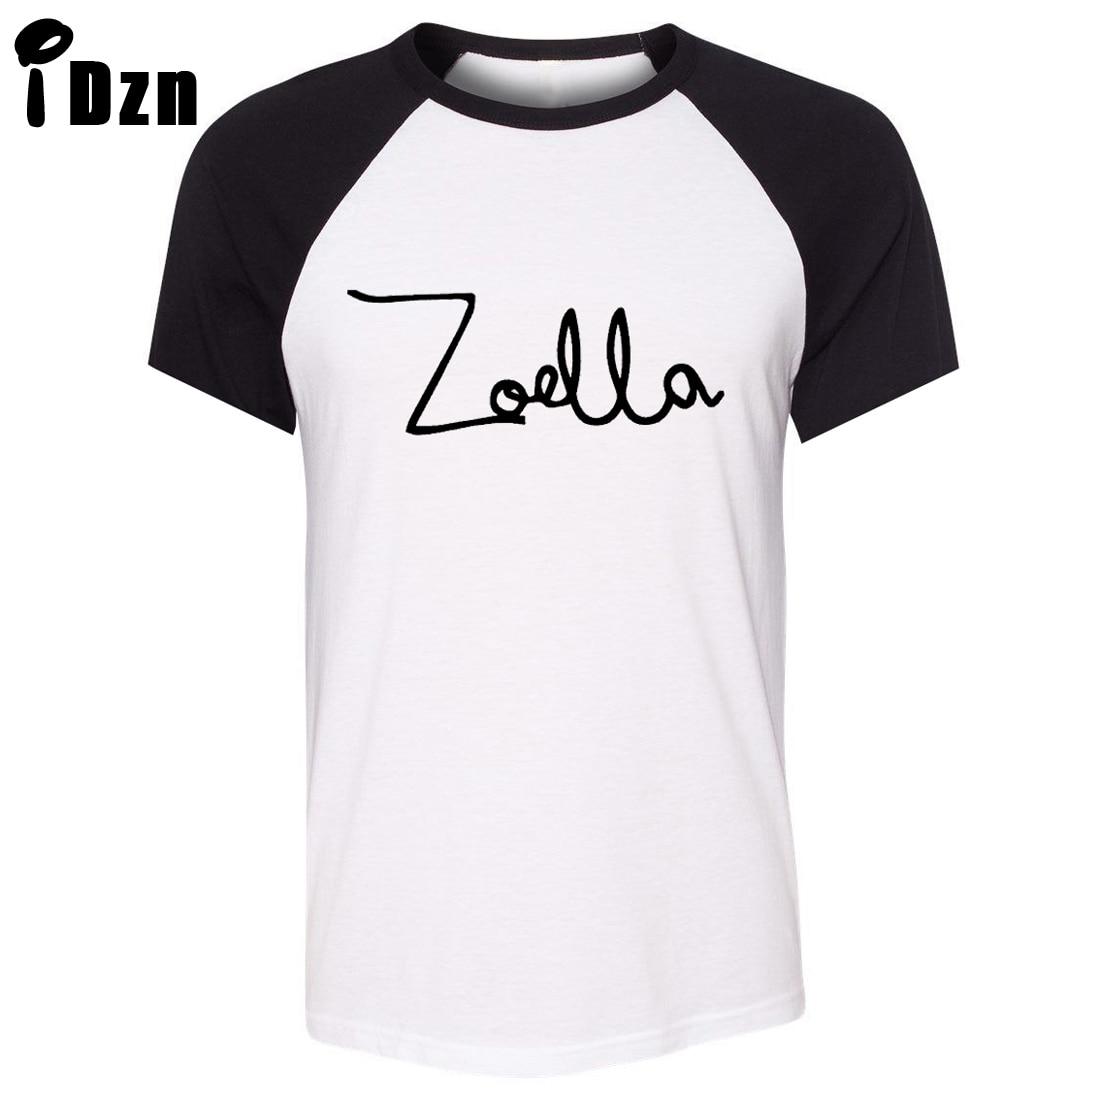 T shirt design youtube - Best Fashion Summer Short Sleeve T Shirt Zoe Sugg Youtube Zoella Vlog Fashion Just Say Yes Beauty Art Pattern Unisex T Shirt Casual Tee Tops